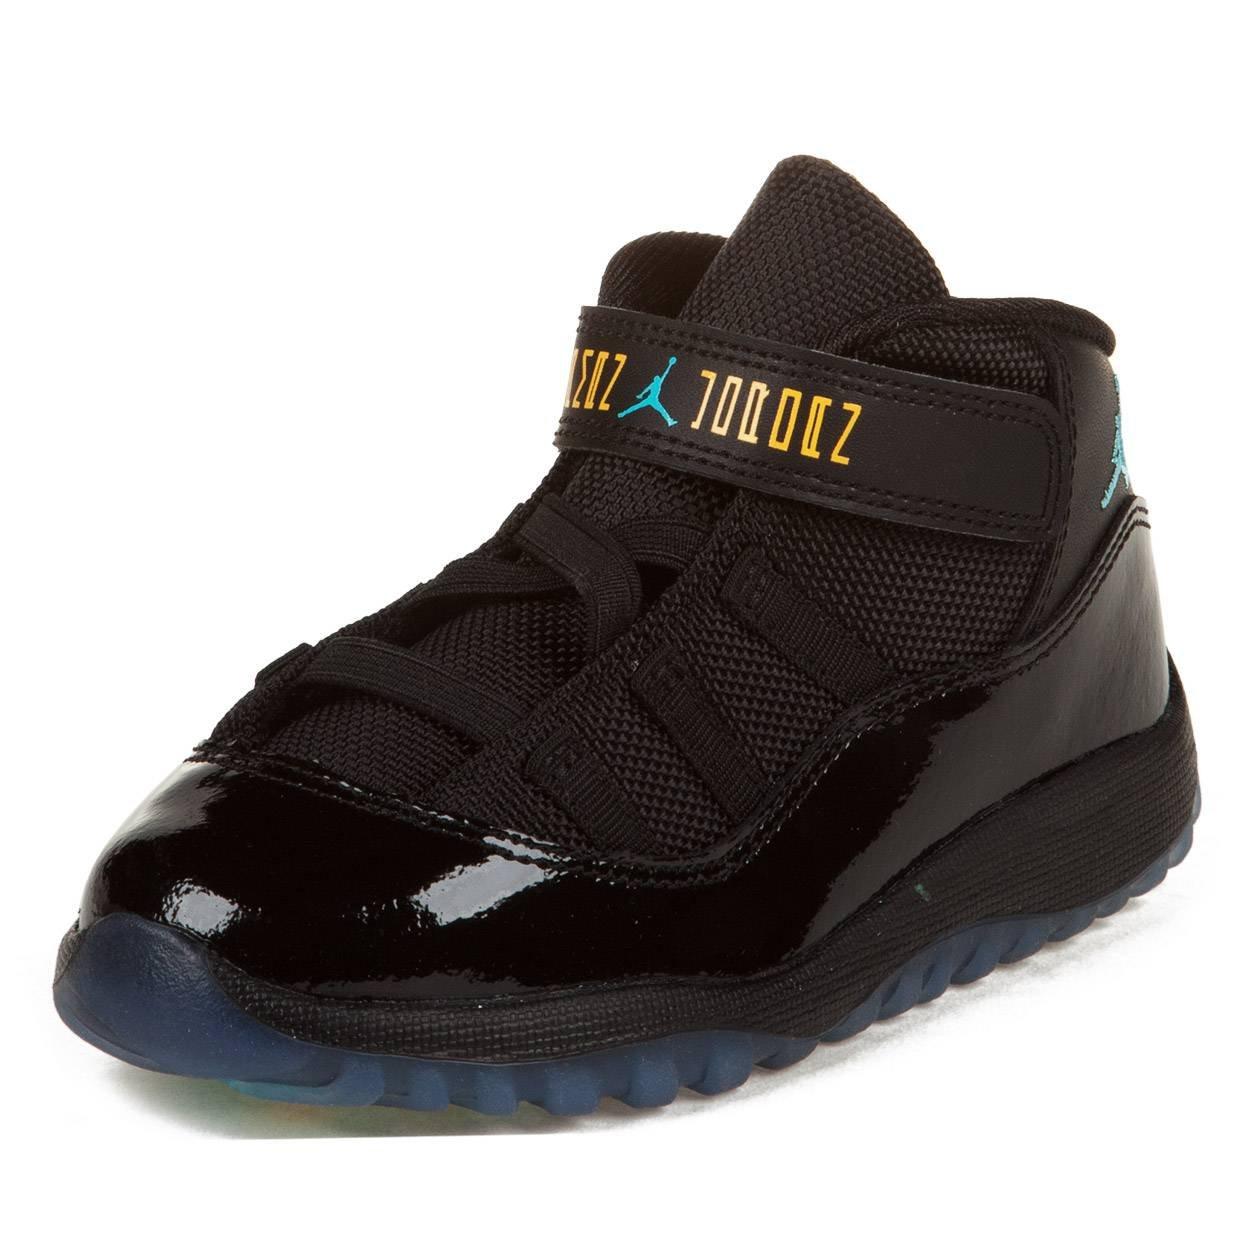 812a73a59 Galleon - Baby Jordan 11 Retro (TD) Basketball Shoes - 378040 006 ...